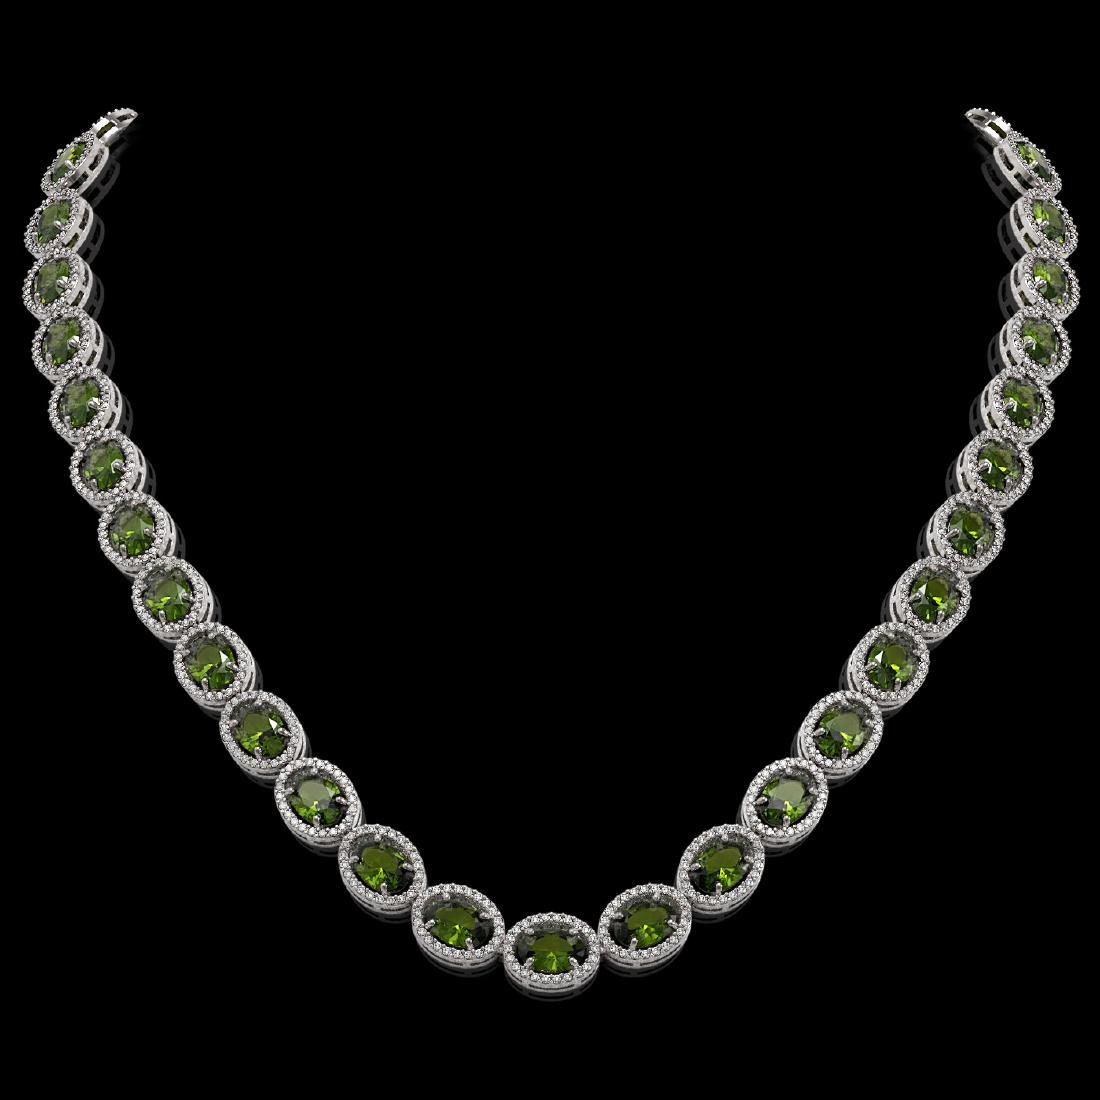 49.46 CTW Tourmaline & Diamond Halo Necklace 10K White